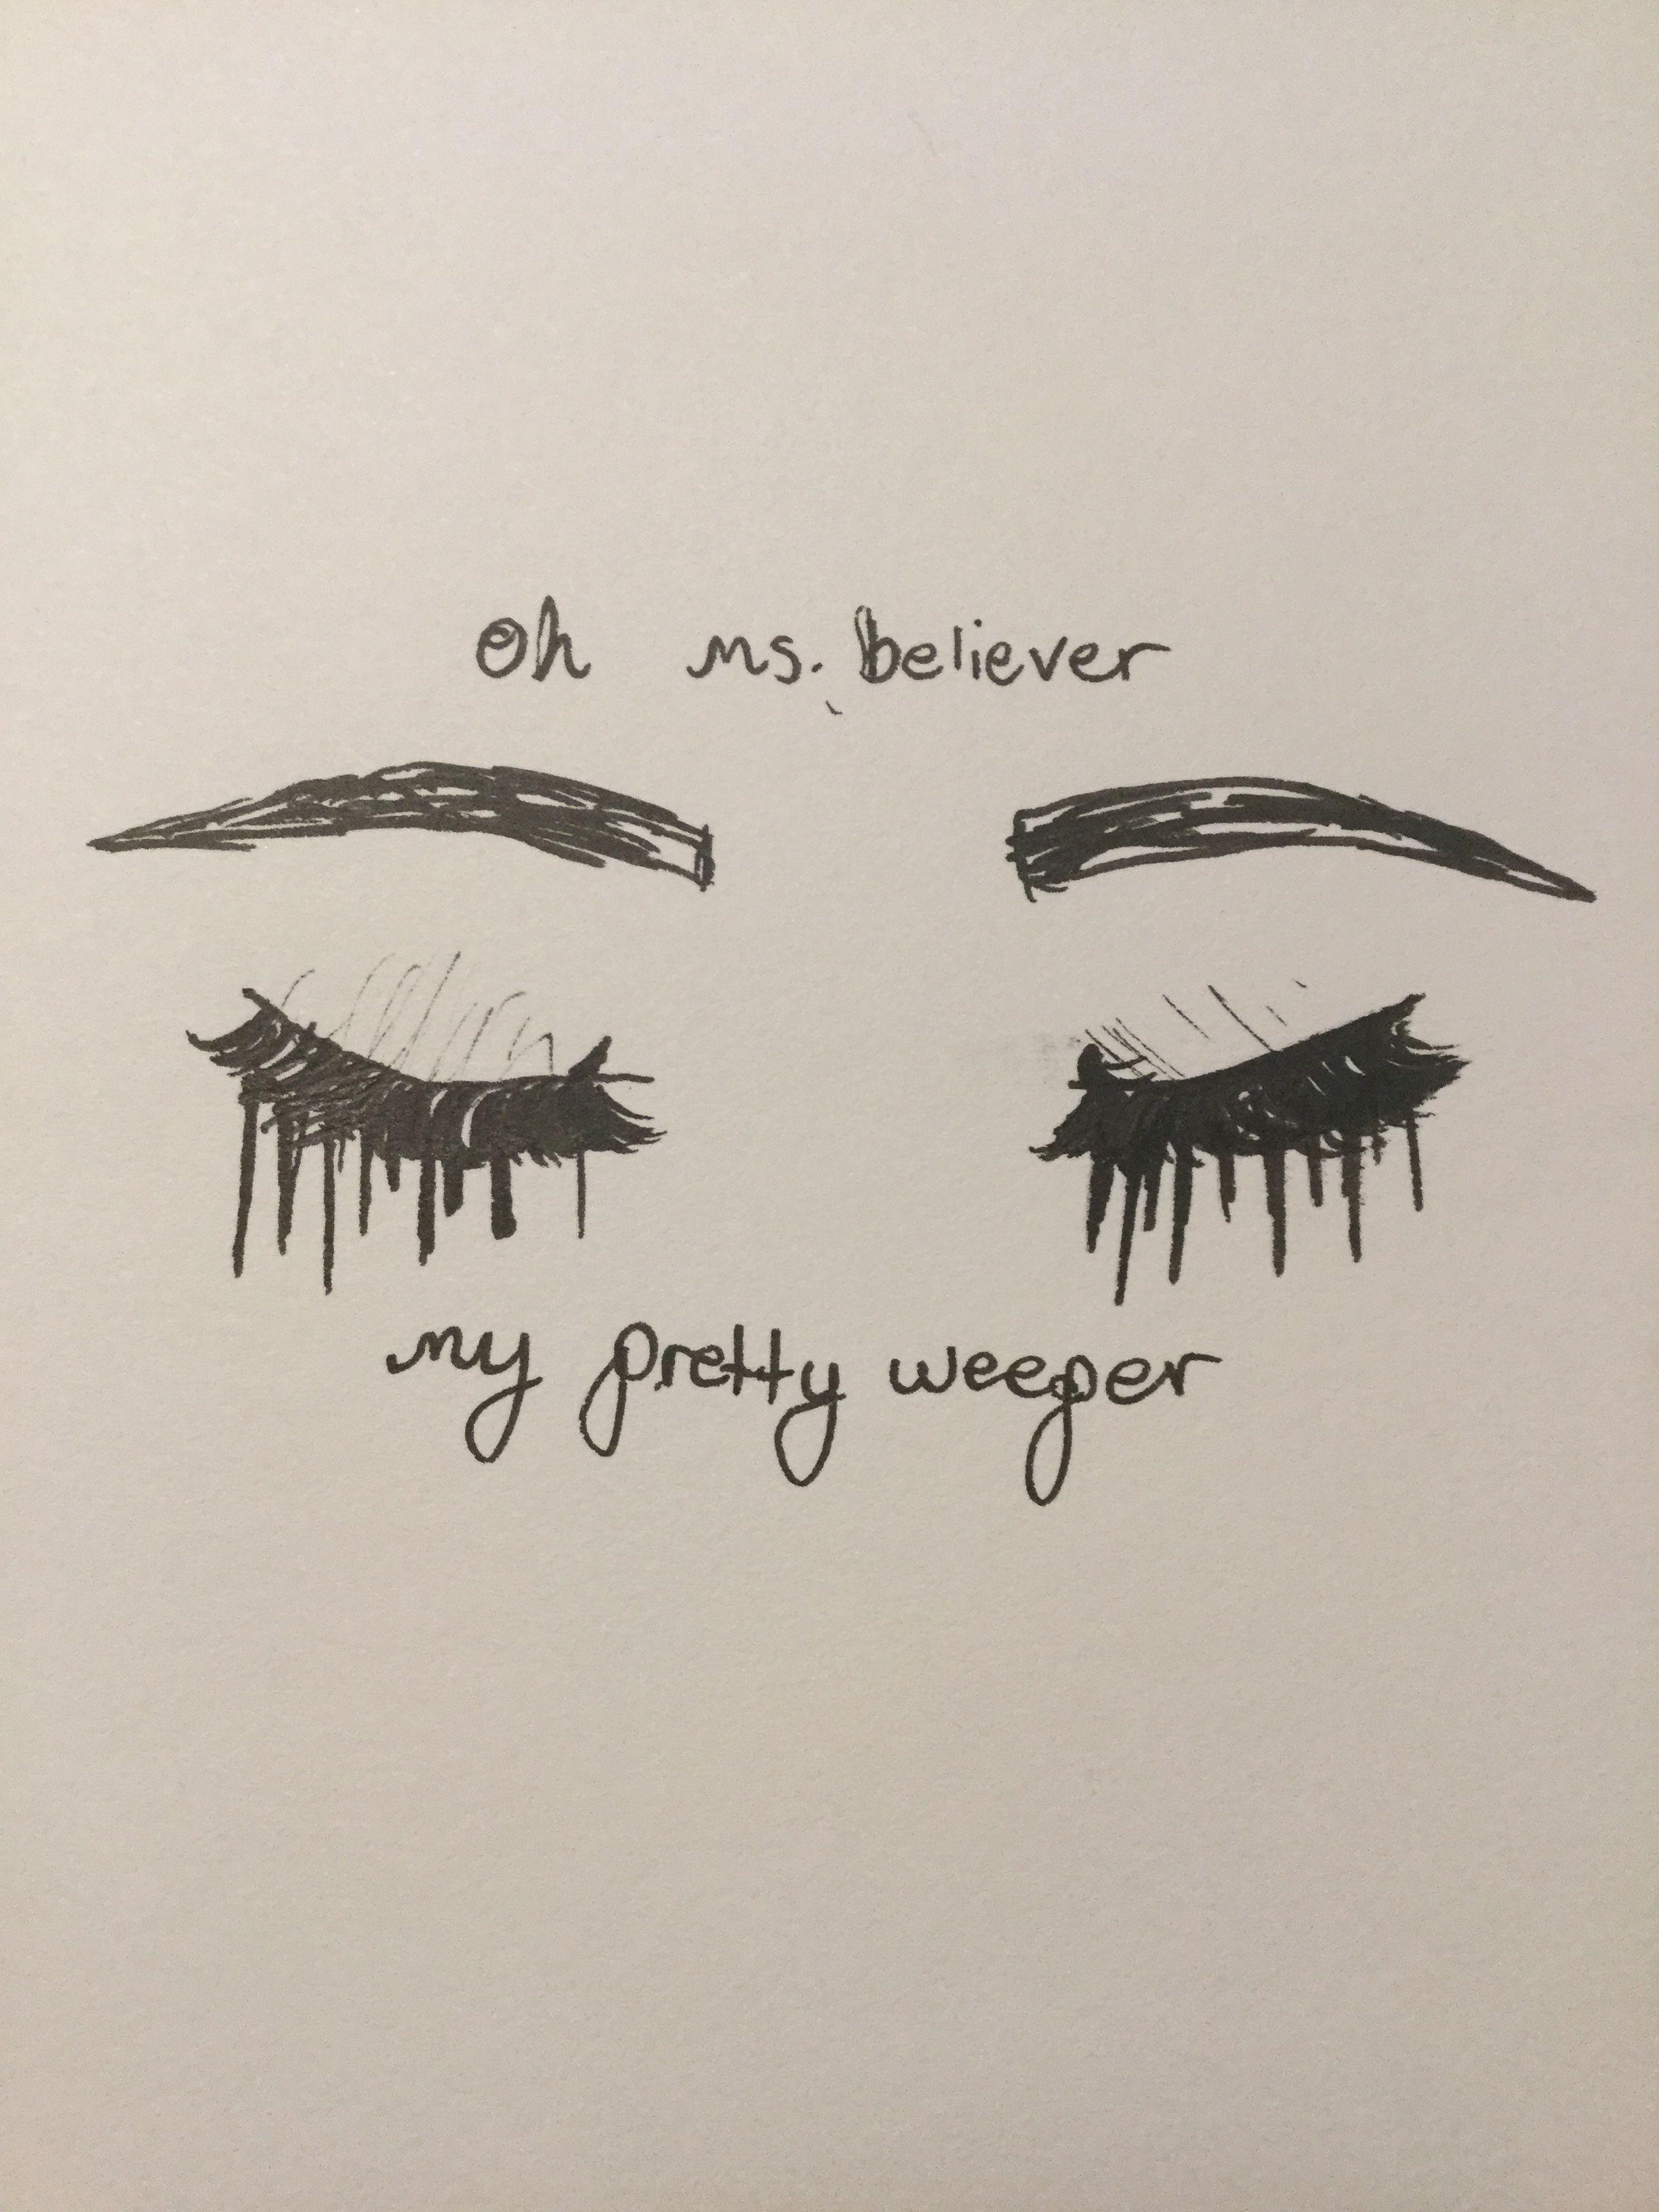 Oh Miss Believer Twenty One Pilots Song Lyrics In